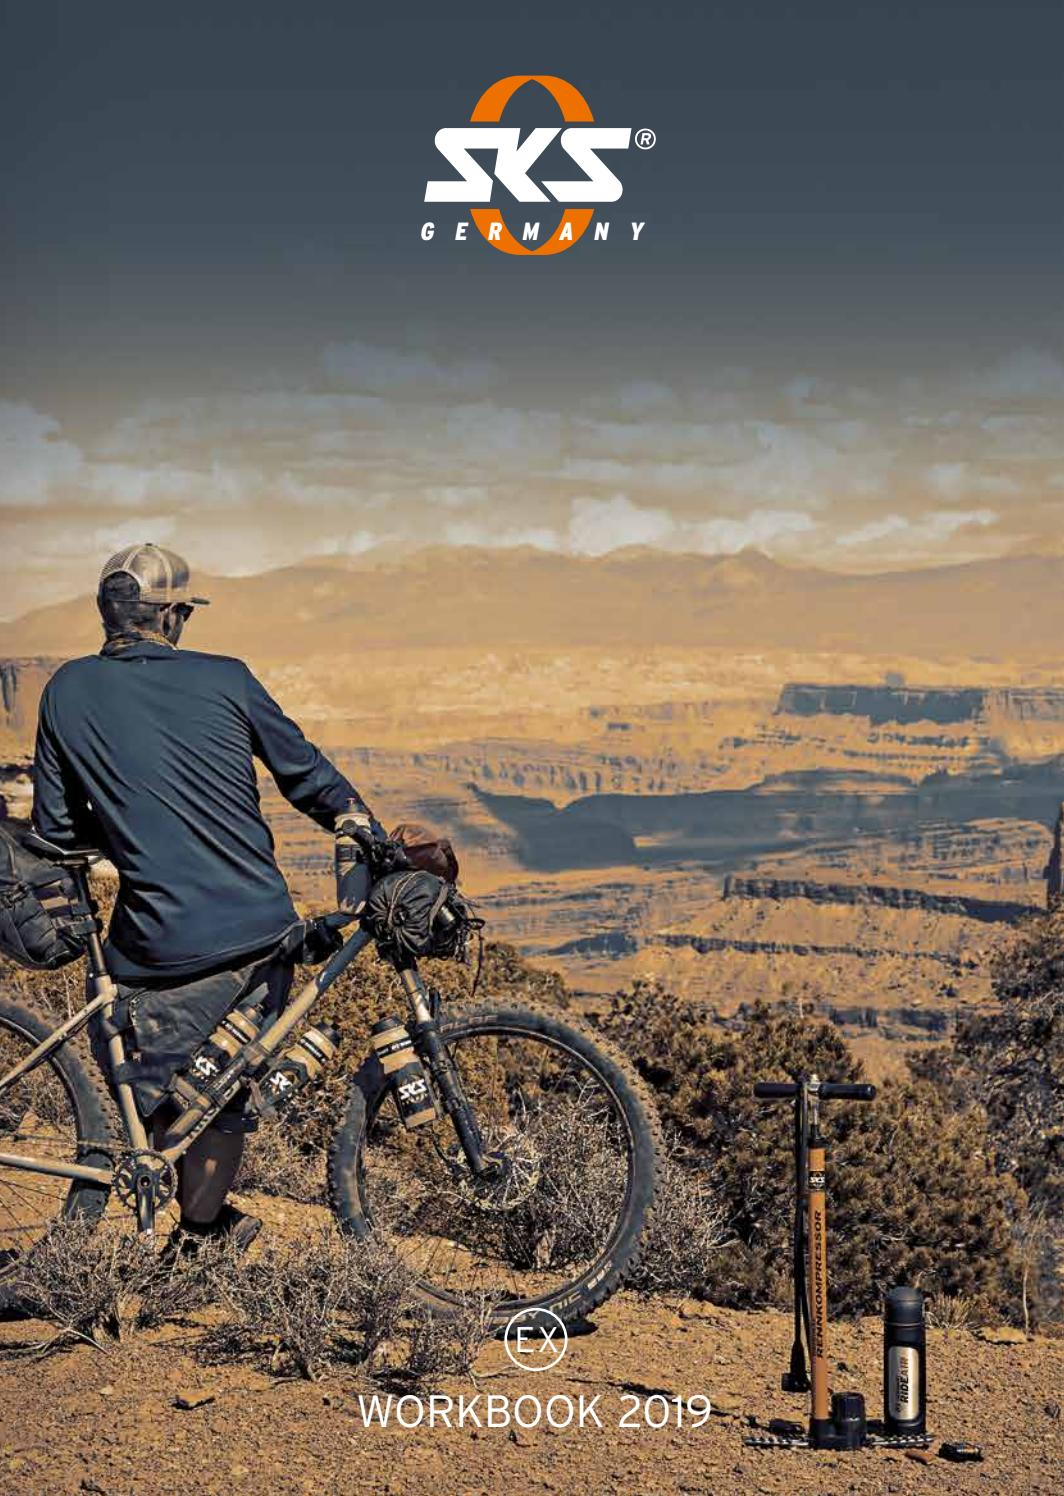 Ultra leicht Fahrrad Vorbau 31,8 Carbon Ummantelung rennrad MTB 31,8 60-110mm Lenkervorbau Stem 100g